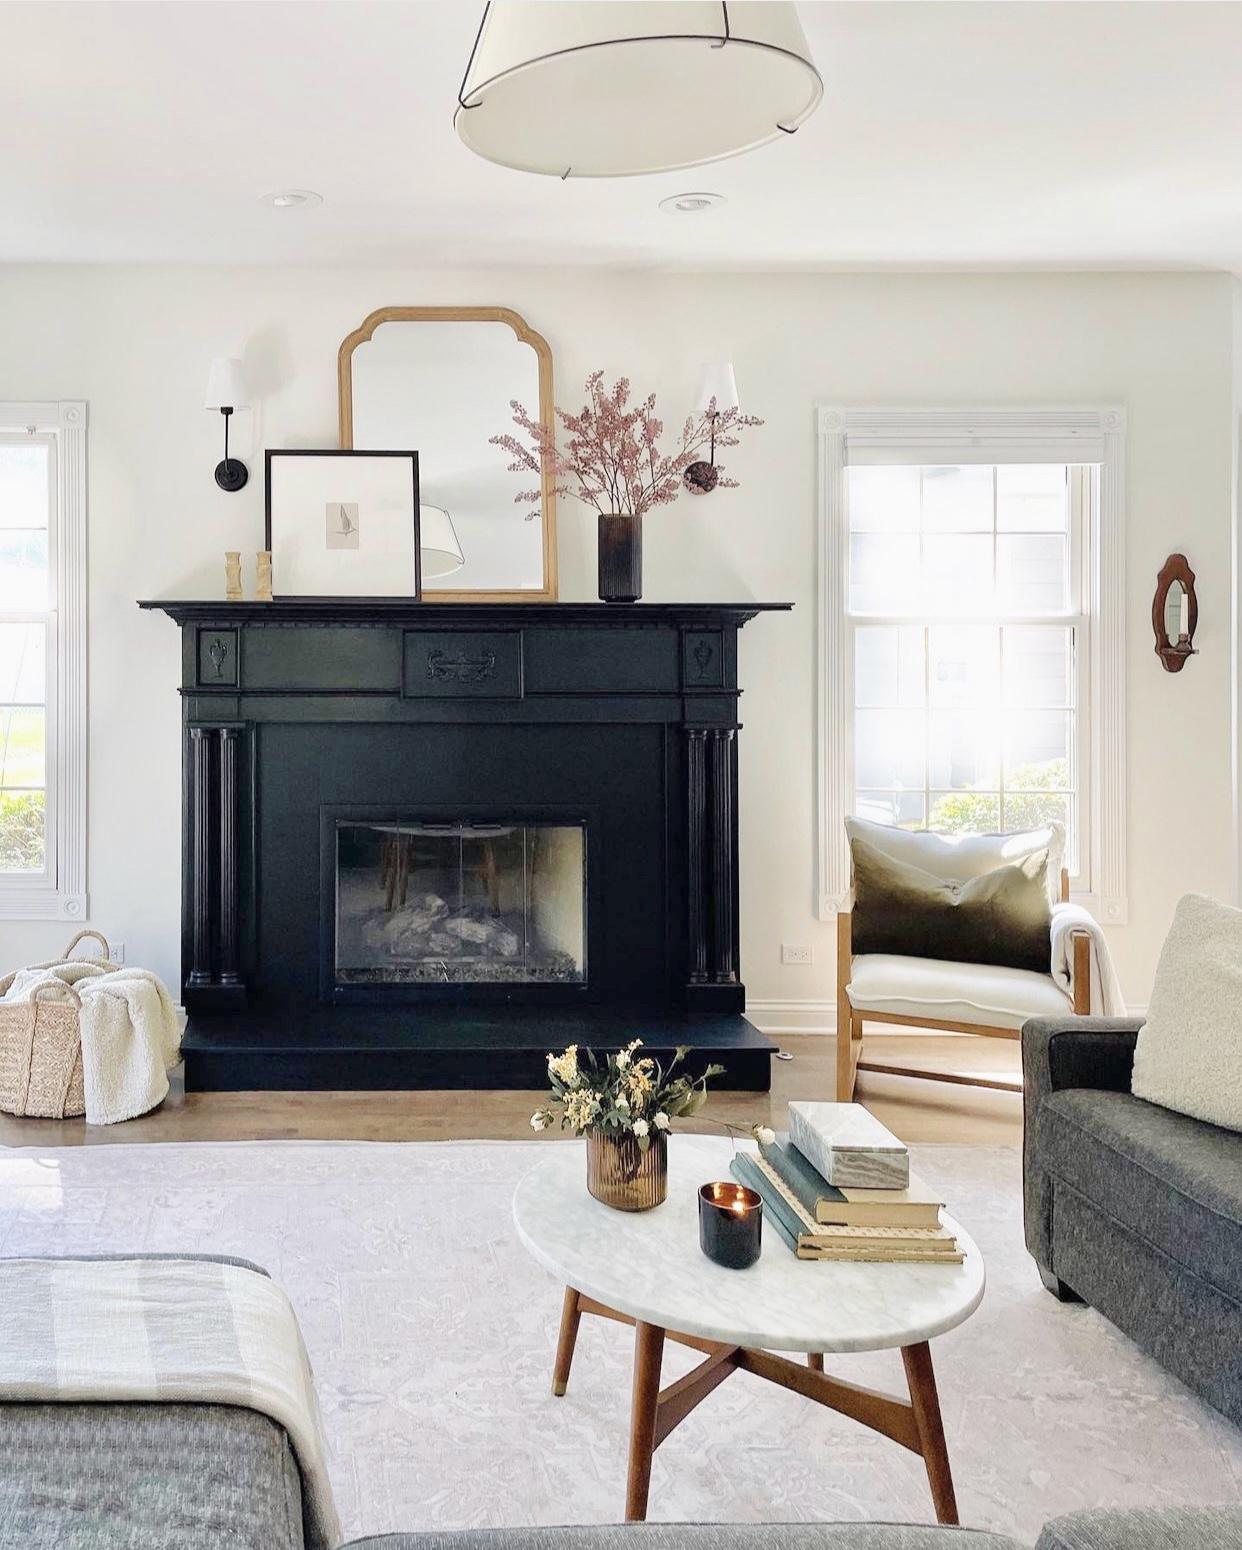 painted-black-fireplace-granite-surround